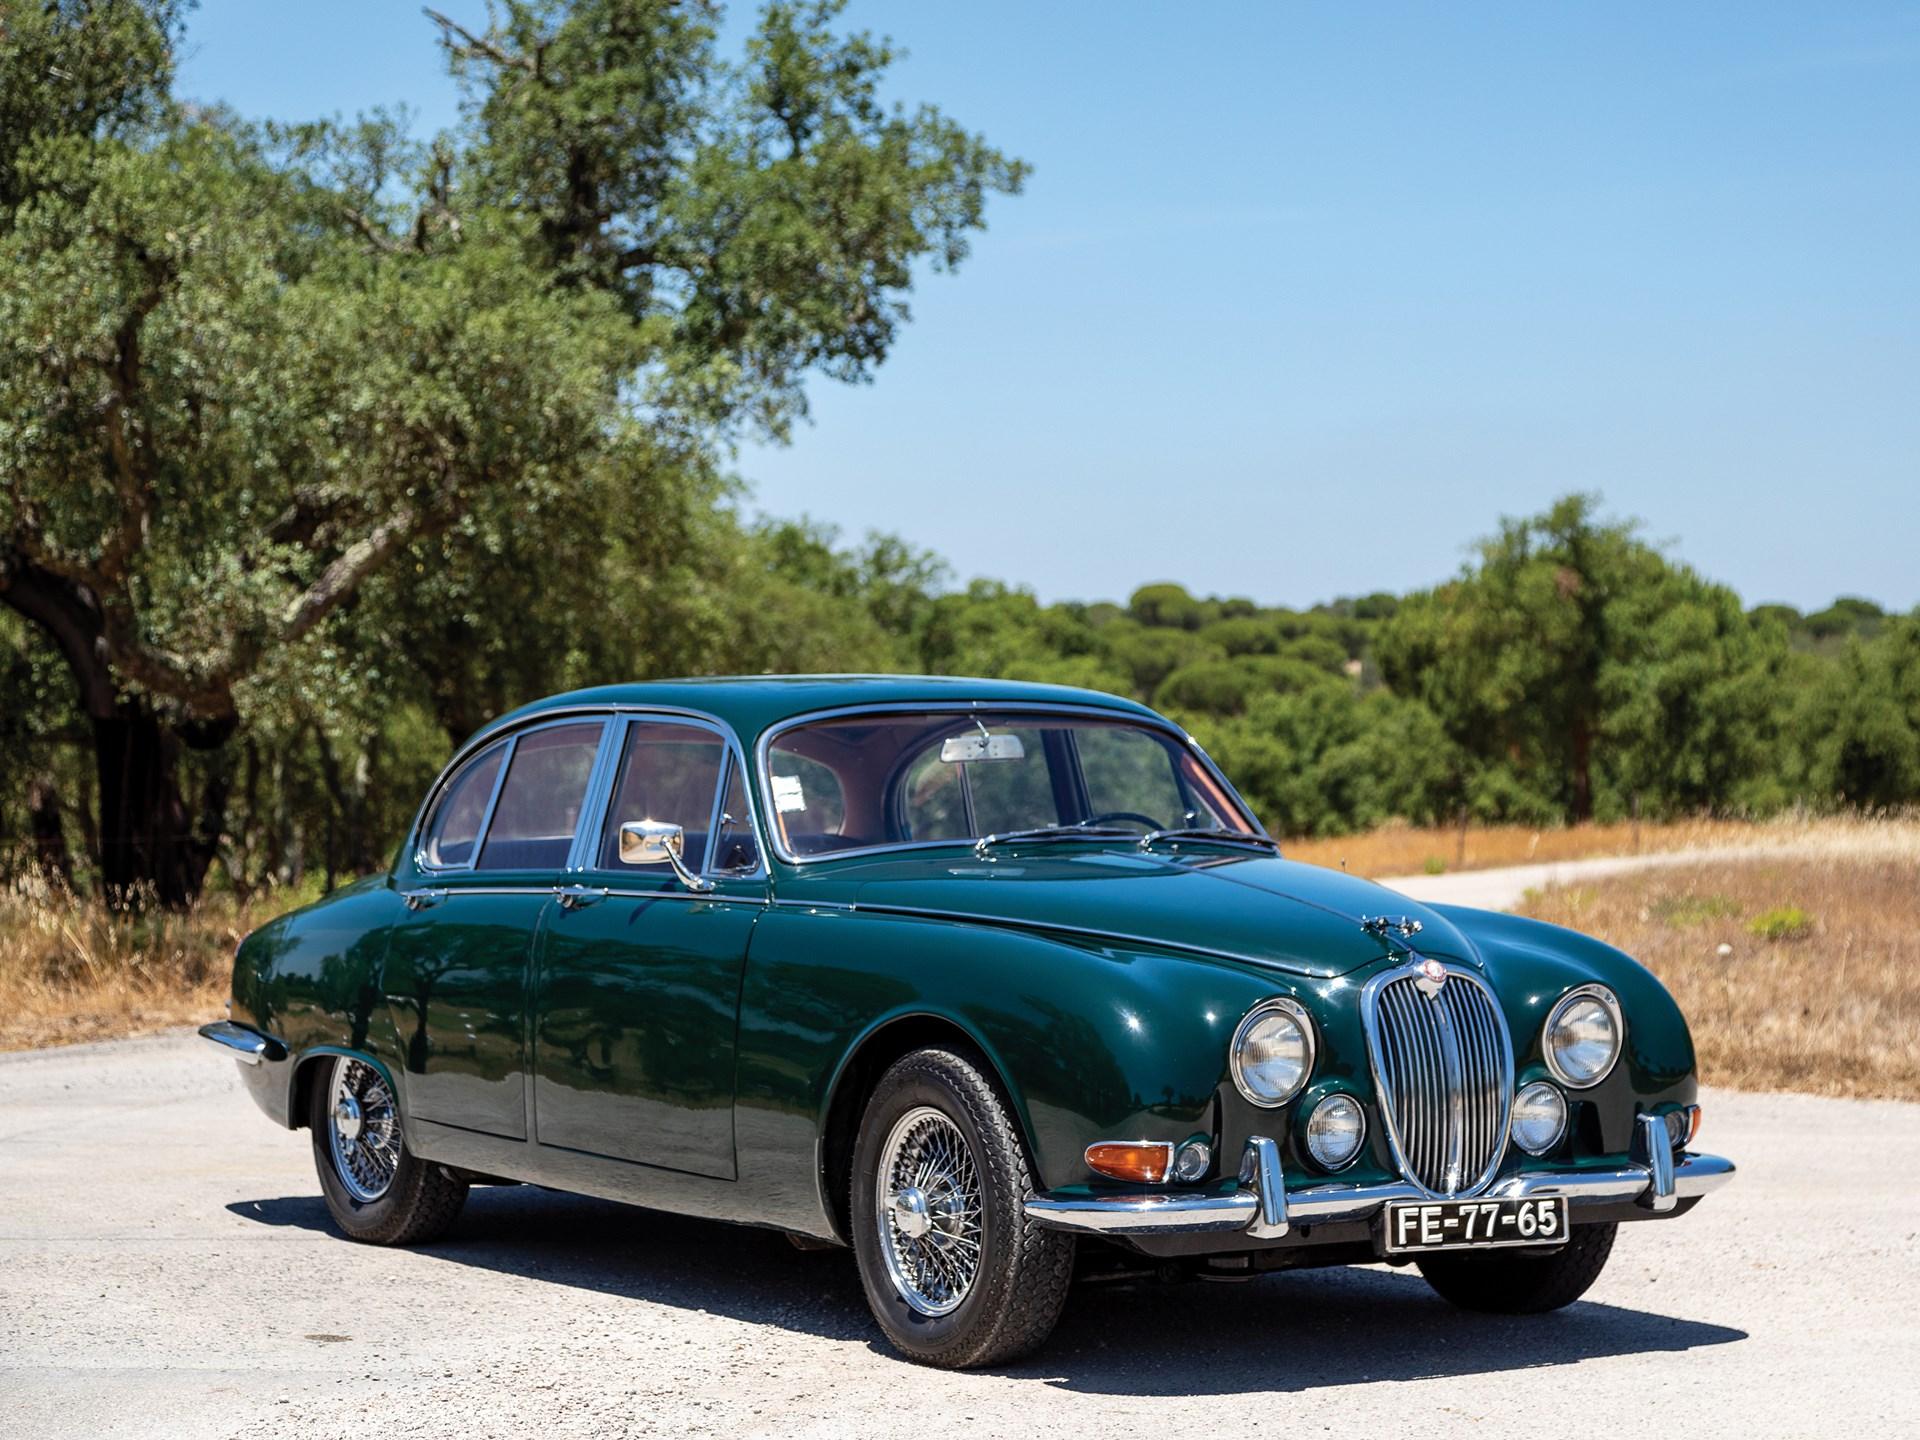 1965 Jaguar S-Type 3.8-Litre Saloon   The Sáragga Collection   RM Sotheby's